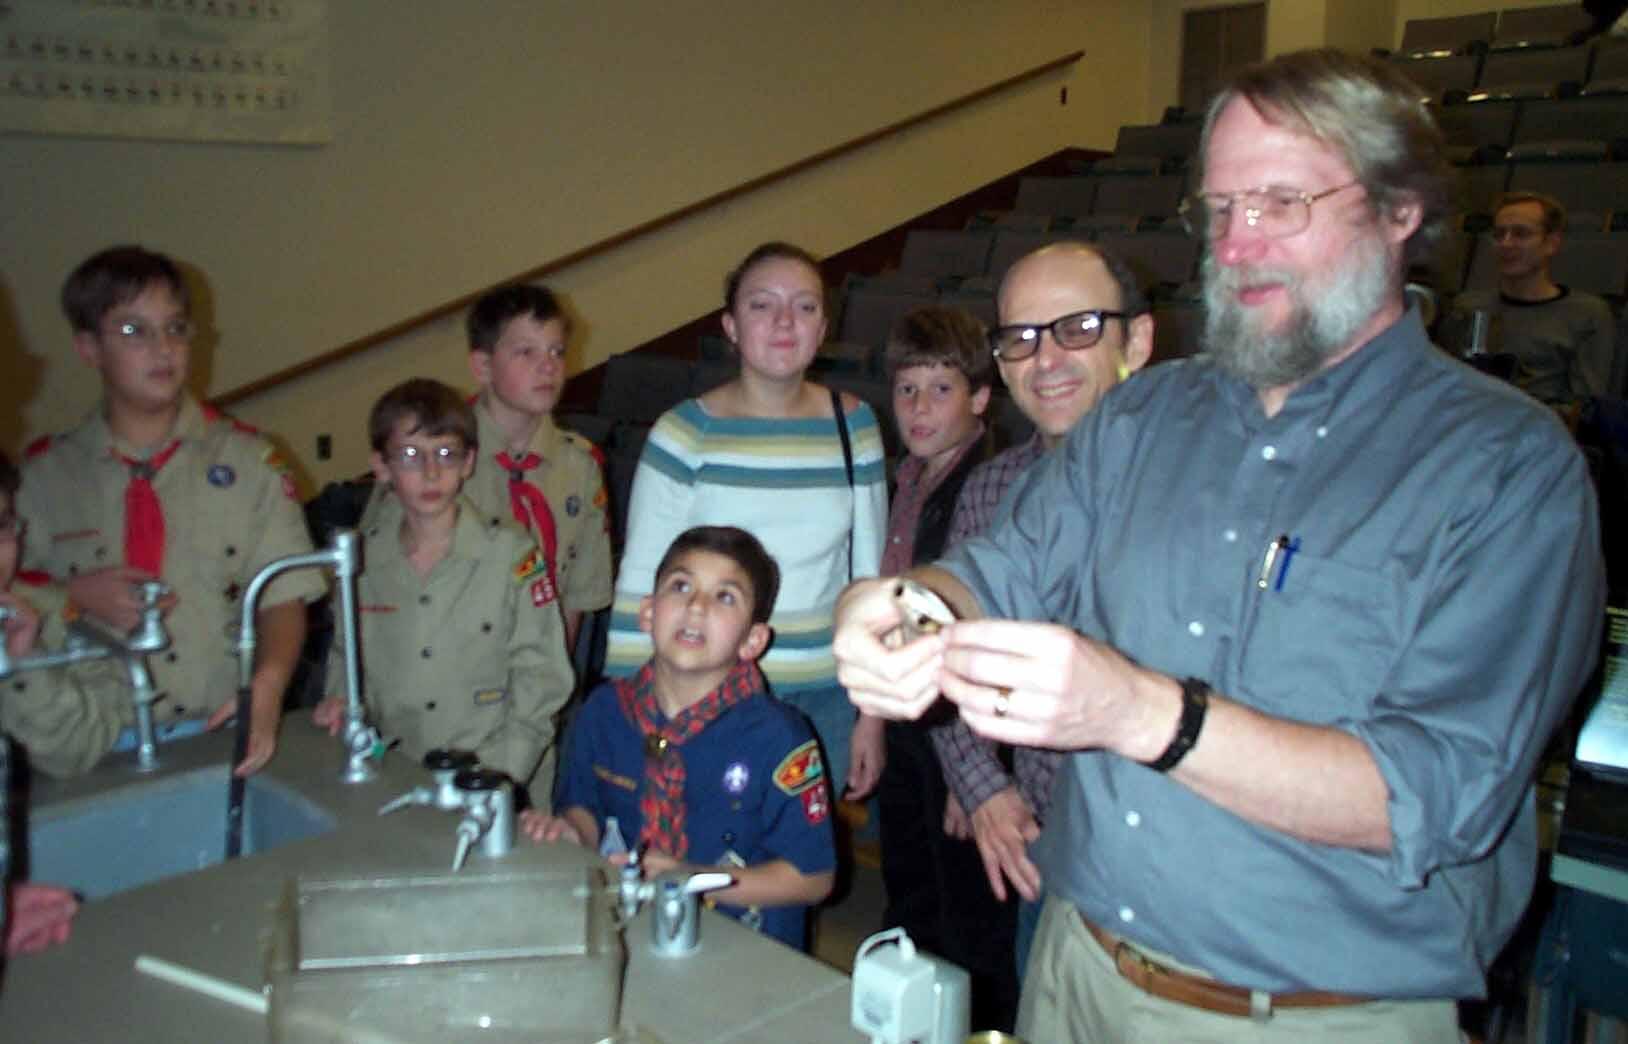 CWRU Biologist Roy Ritzmann with some 2-legged adventurers and a 6 legged friend.